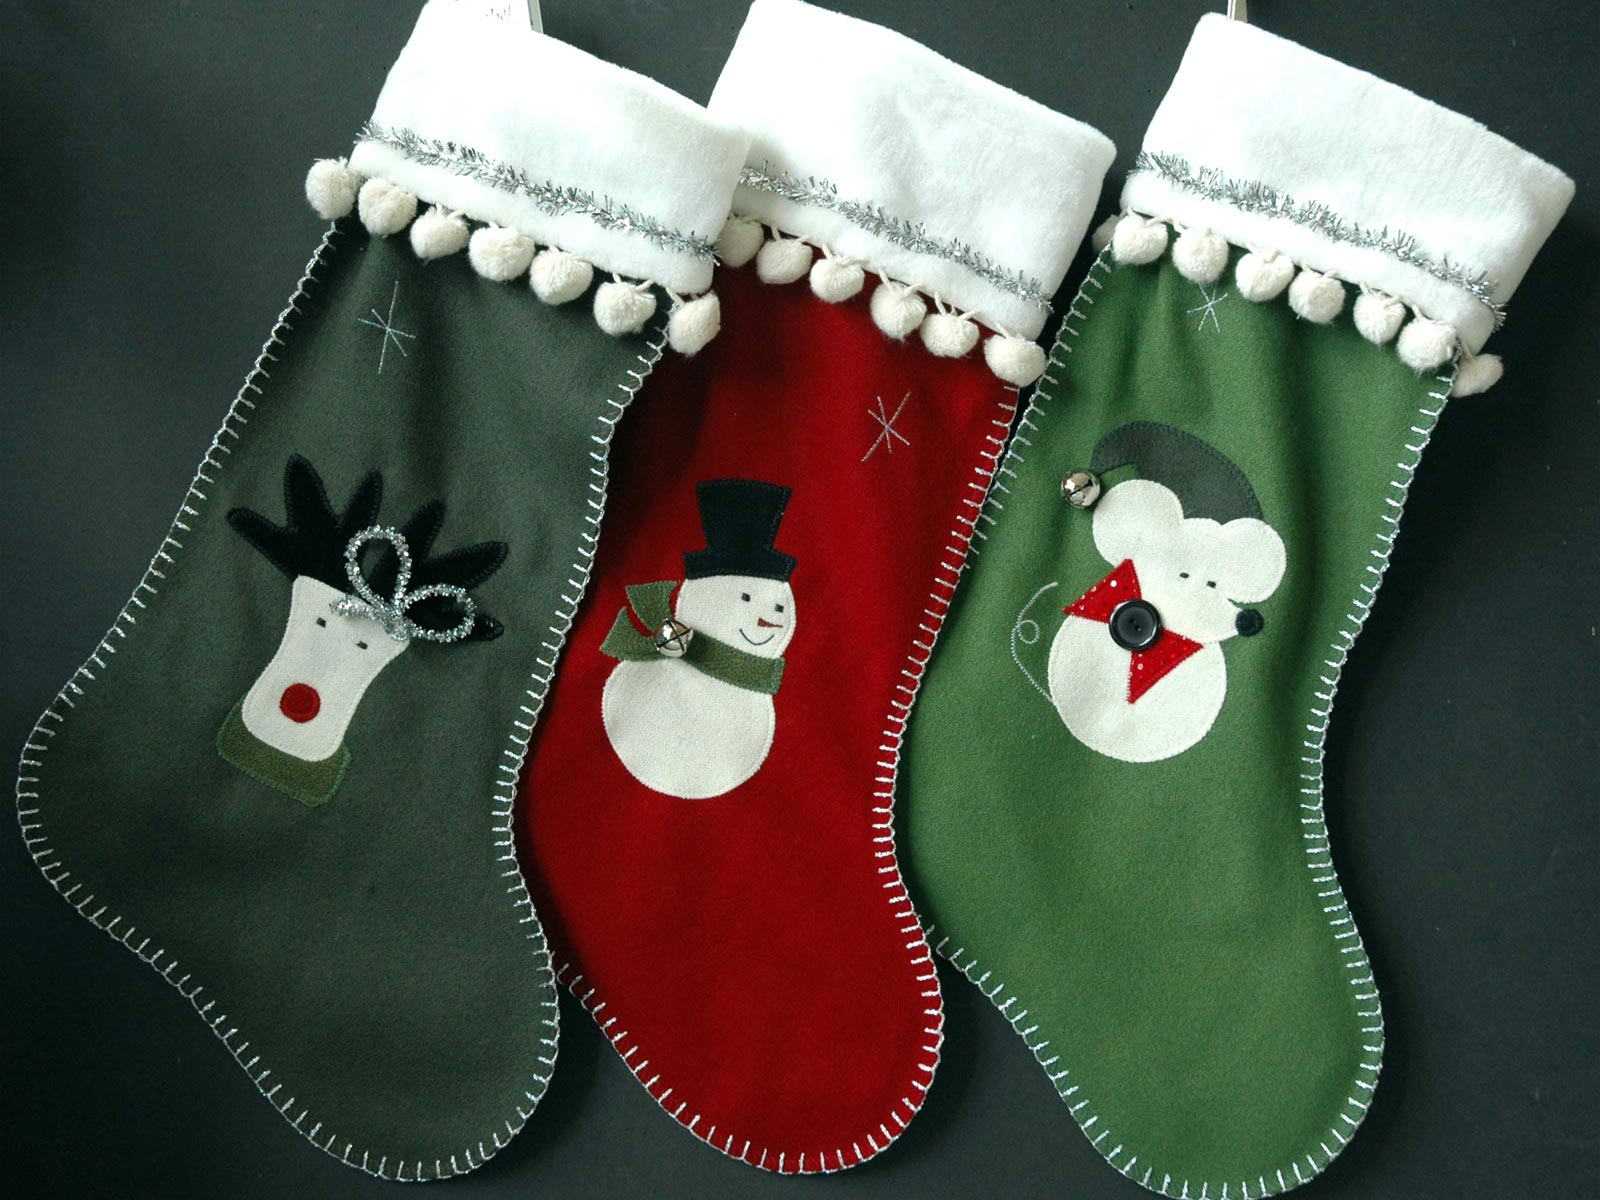 http://3.bp.blogspot.com/-DswchssevZQ/UL36nCpDRQI/AAAAAAAAA-4/x9WBgGiDuUs/s1600/Christmas_Stockings.jpg